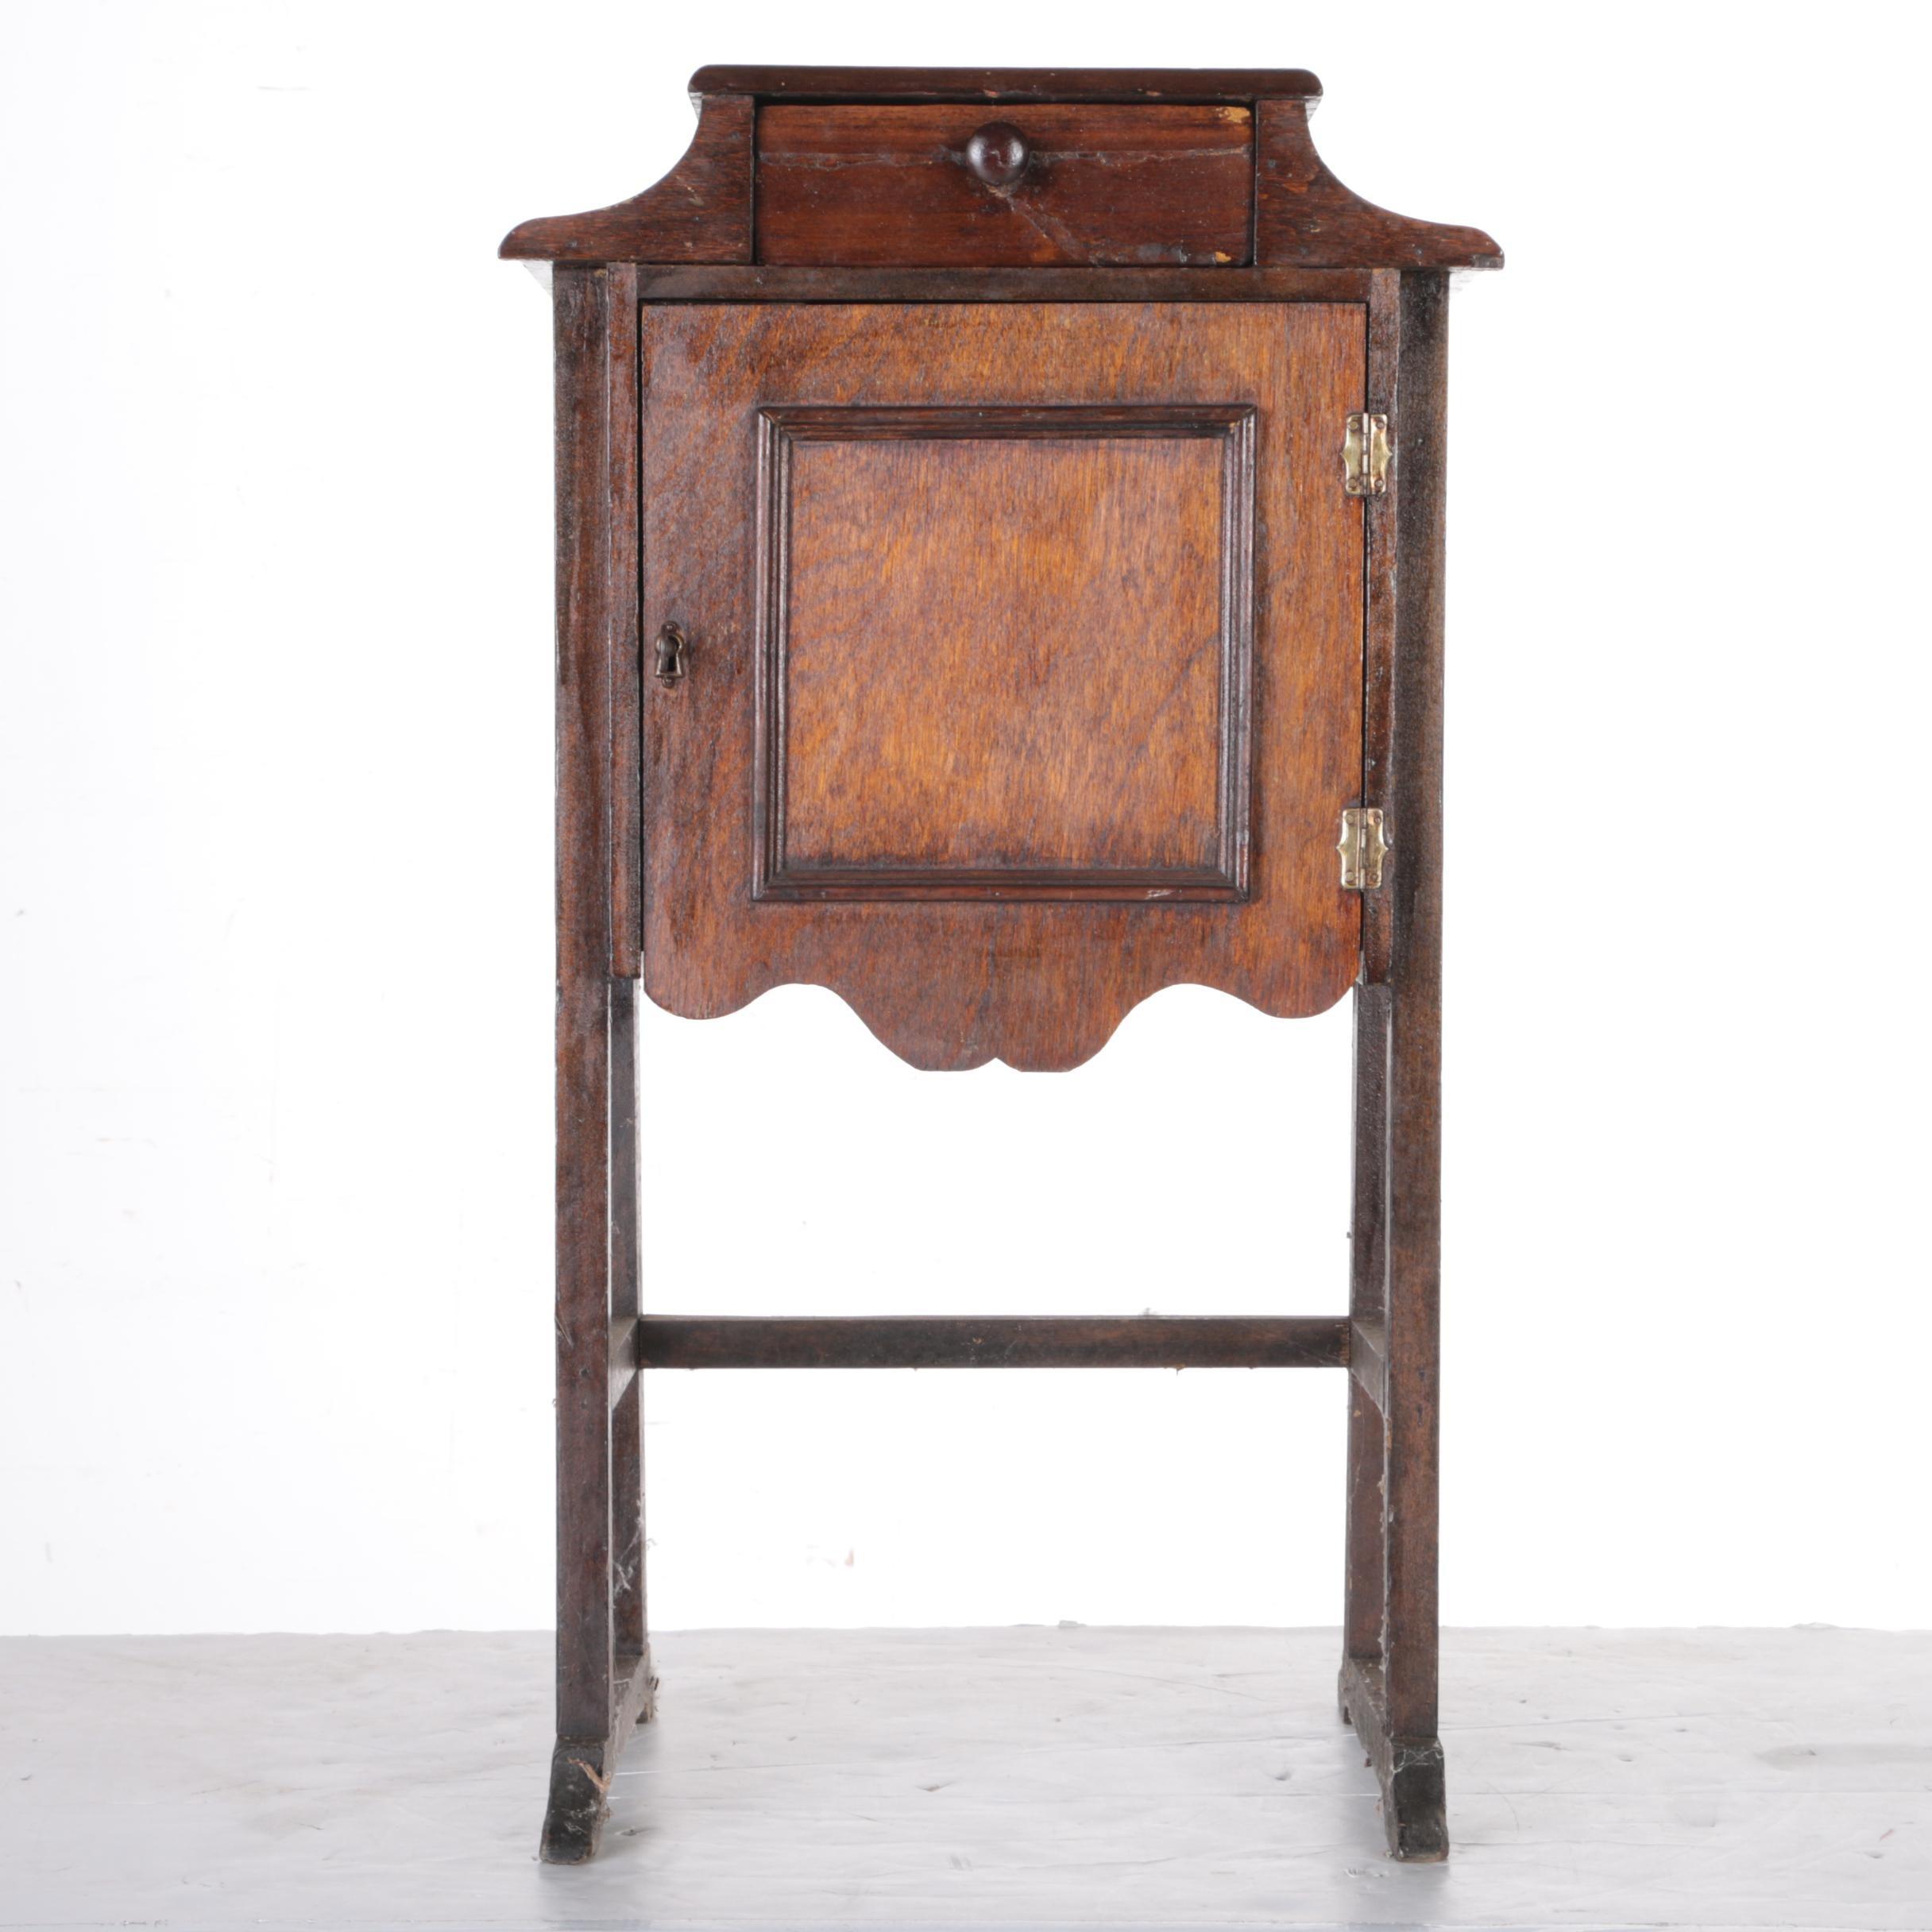 Vintage Smoking Cabinet with a Mahogany Finish